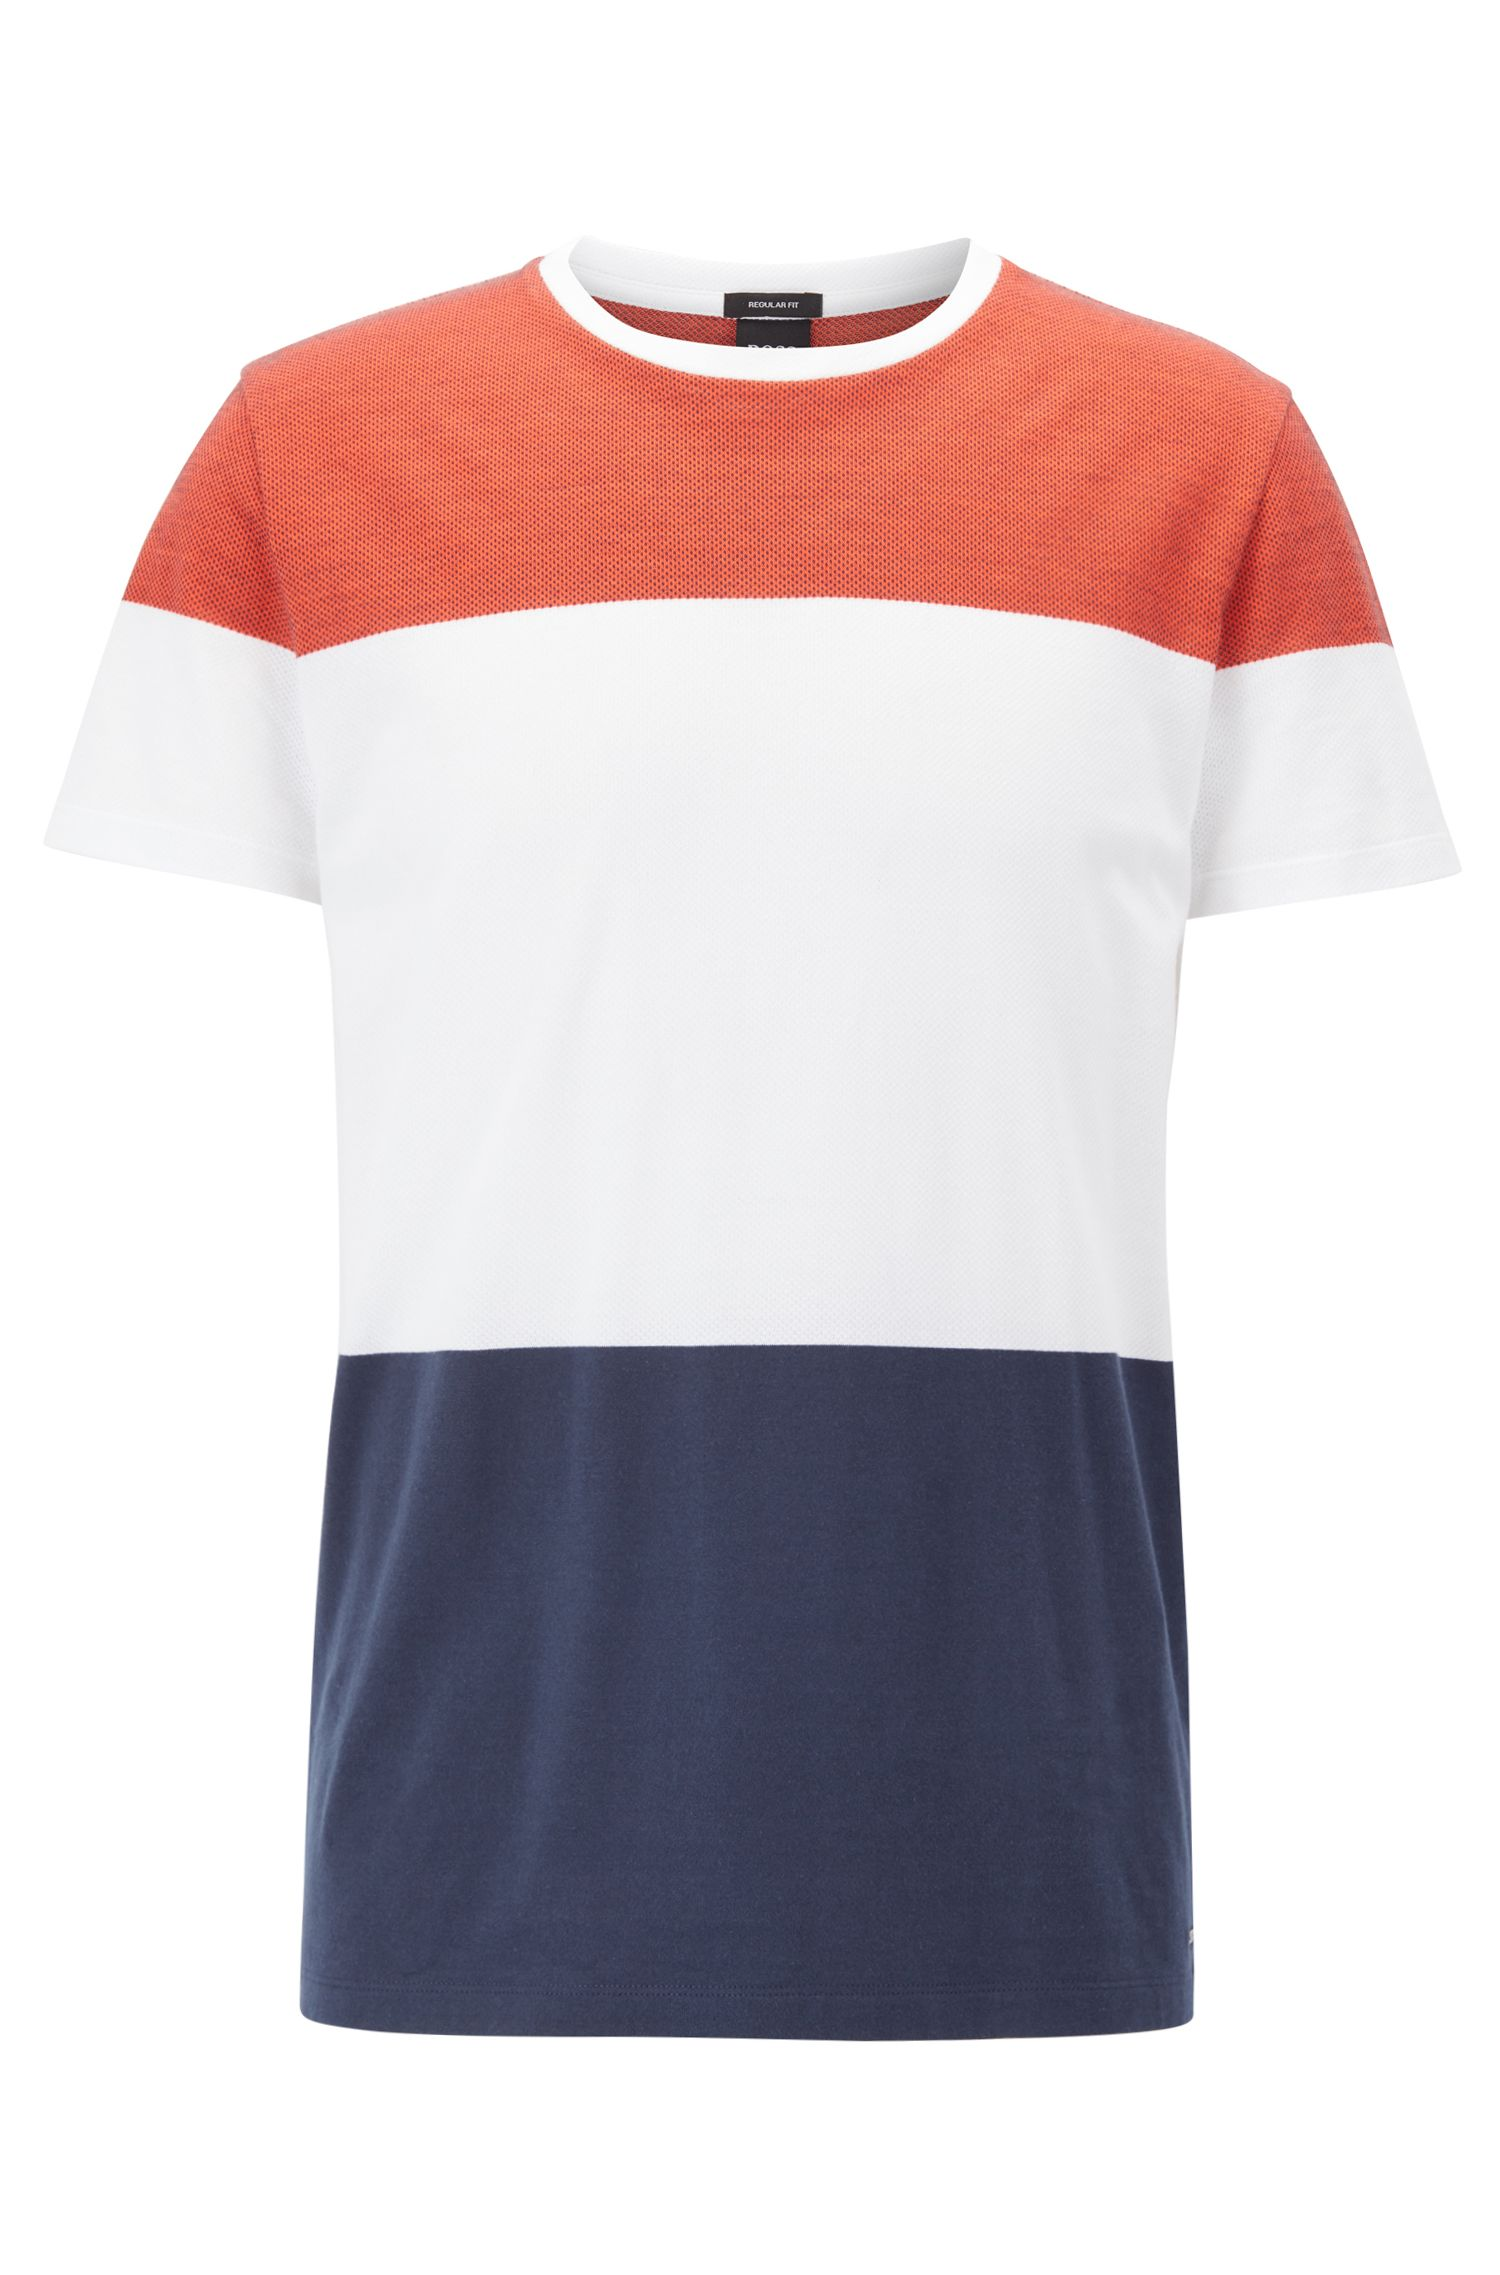 Colorblocked Cotton T-Shirt | Tiburt, Orange